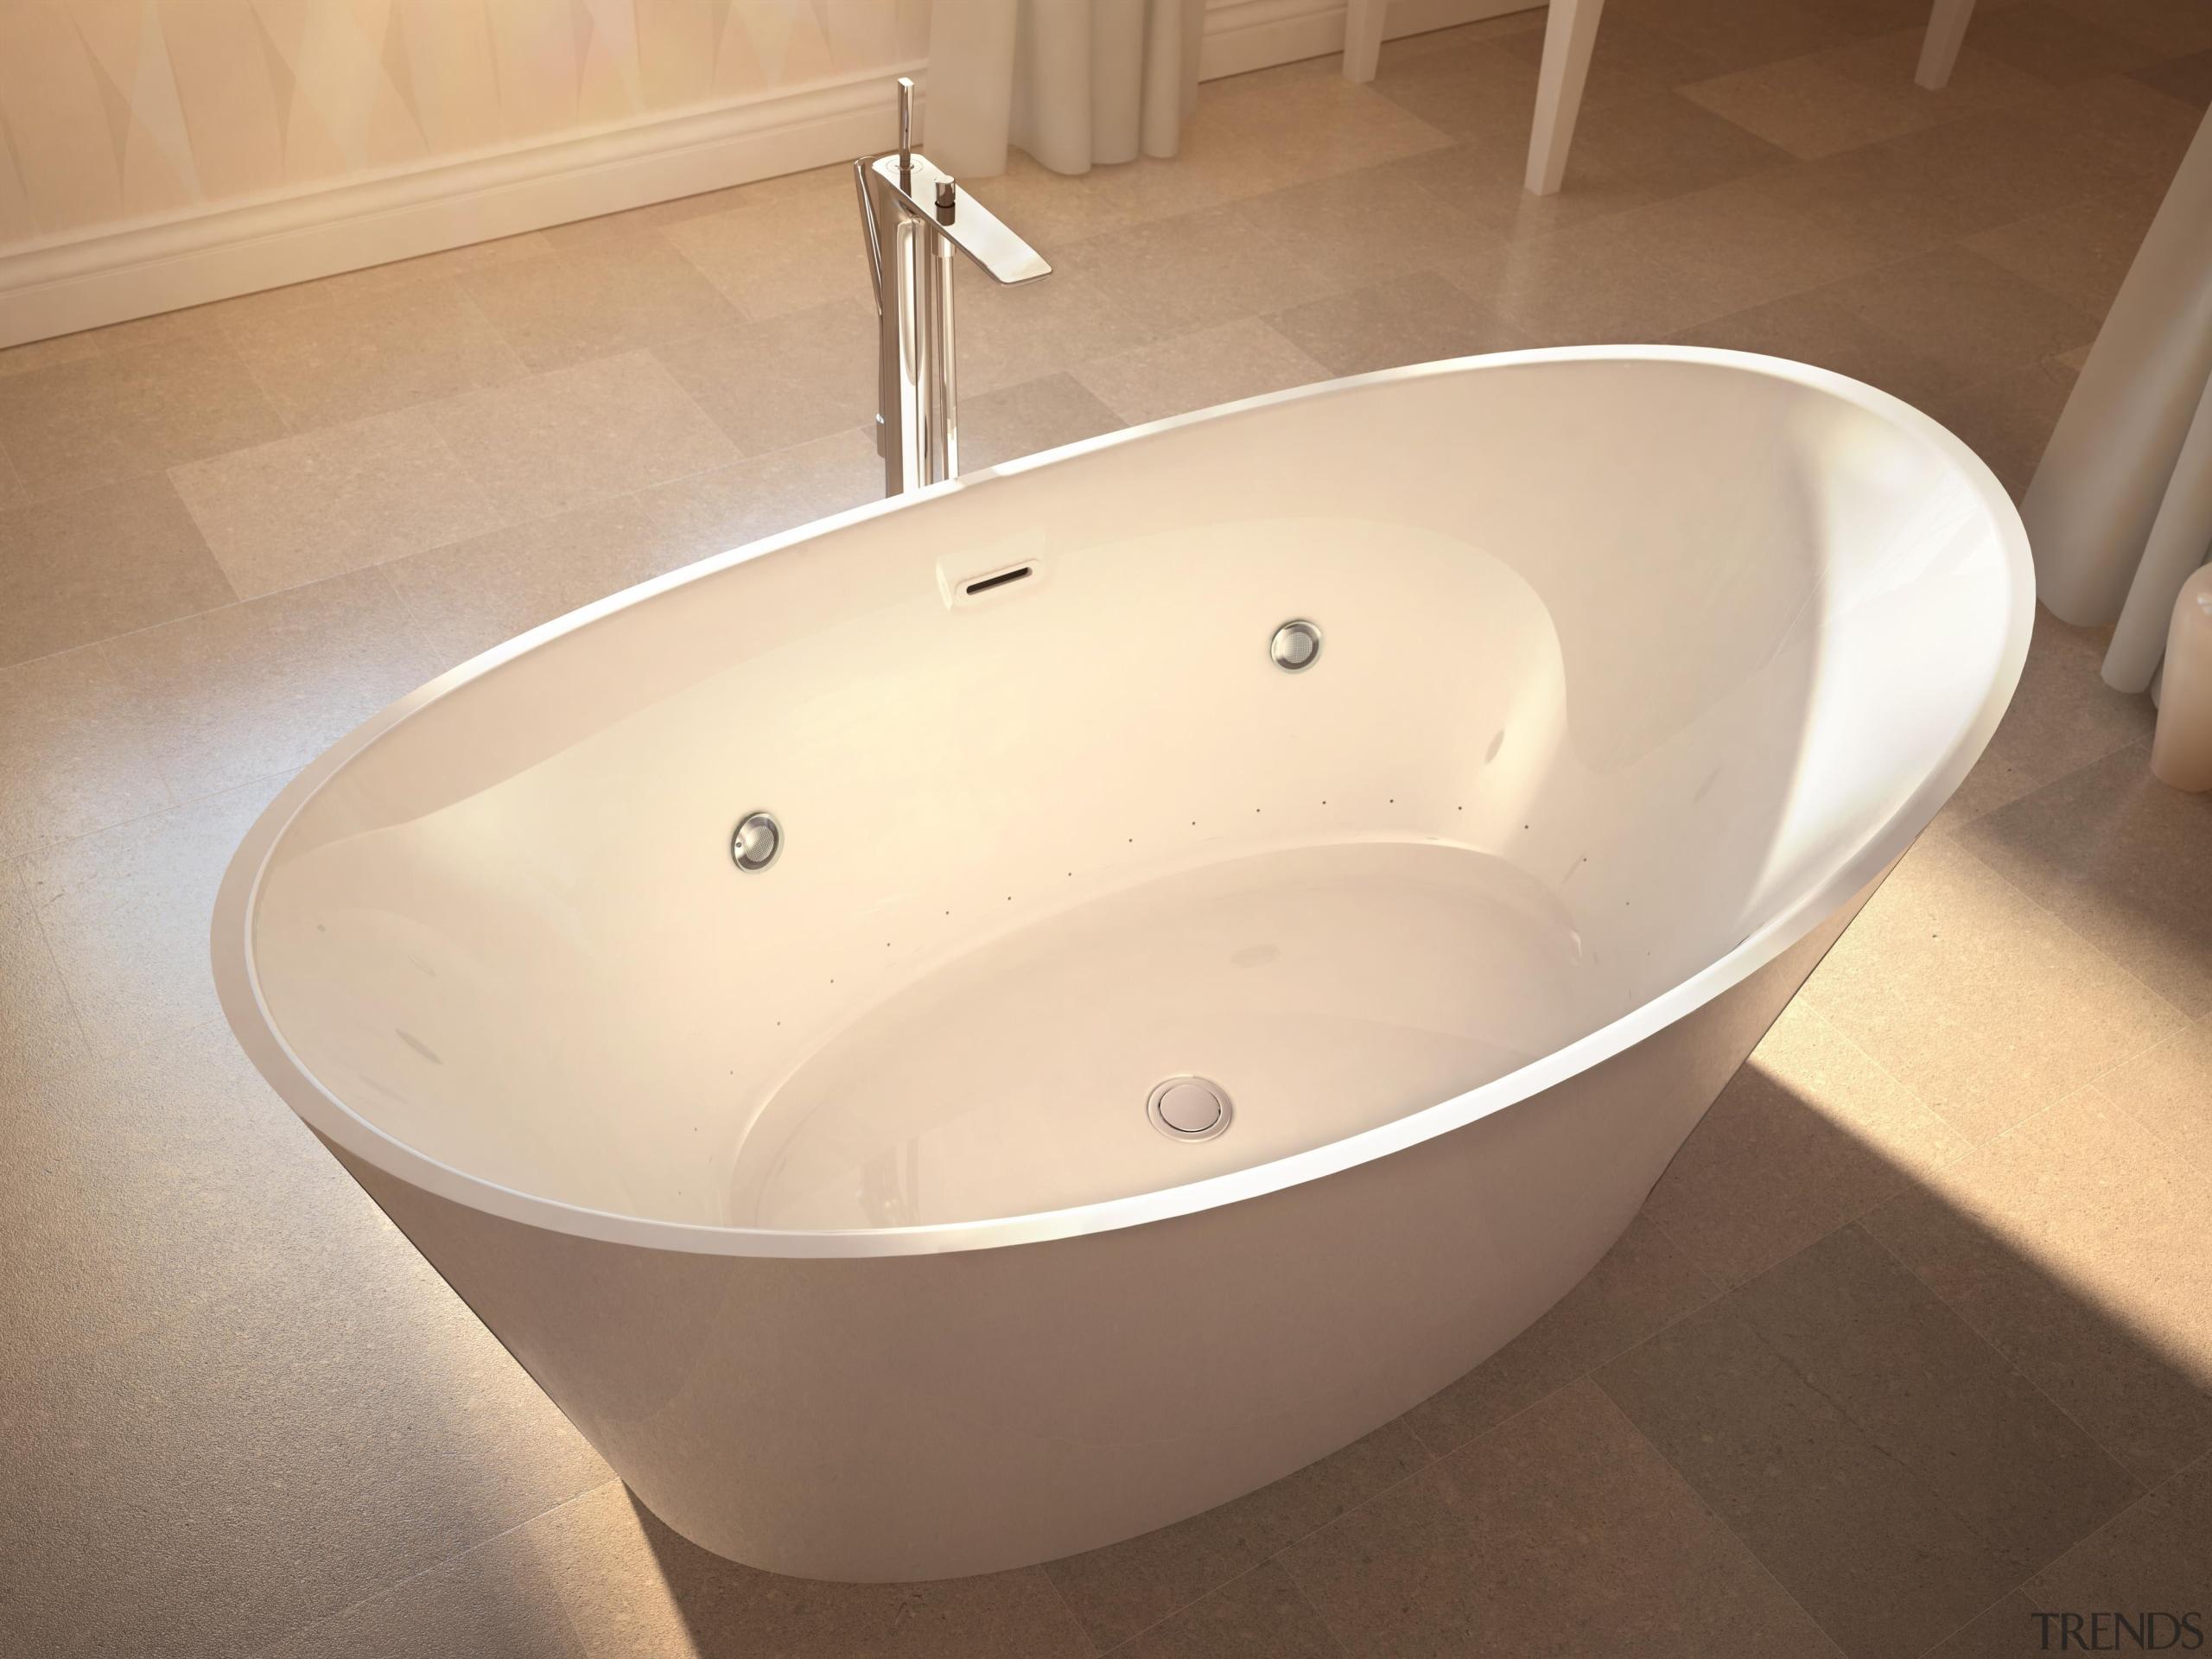 evanescence 6636 closeup .jpg - evanescence_6636_closeup_.jpg - angle angle, bathroom, bathroom sink, bathtub, ceramic, plumbing fixture, product design, sink, tap, toilet seat, orange, brown